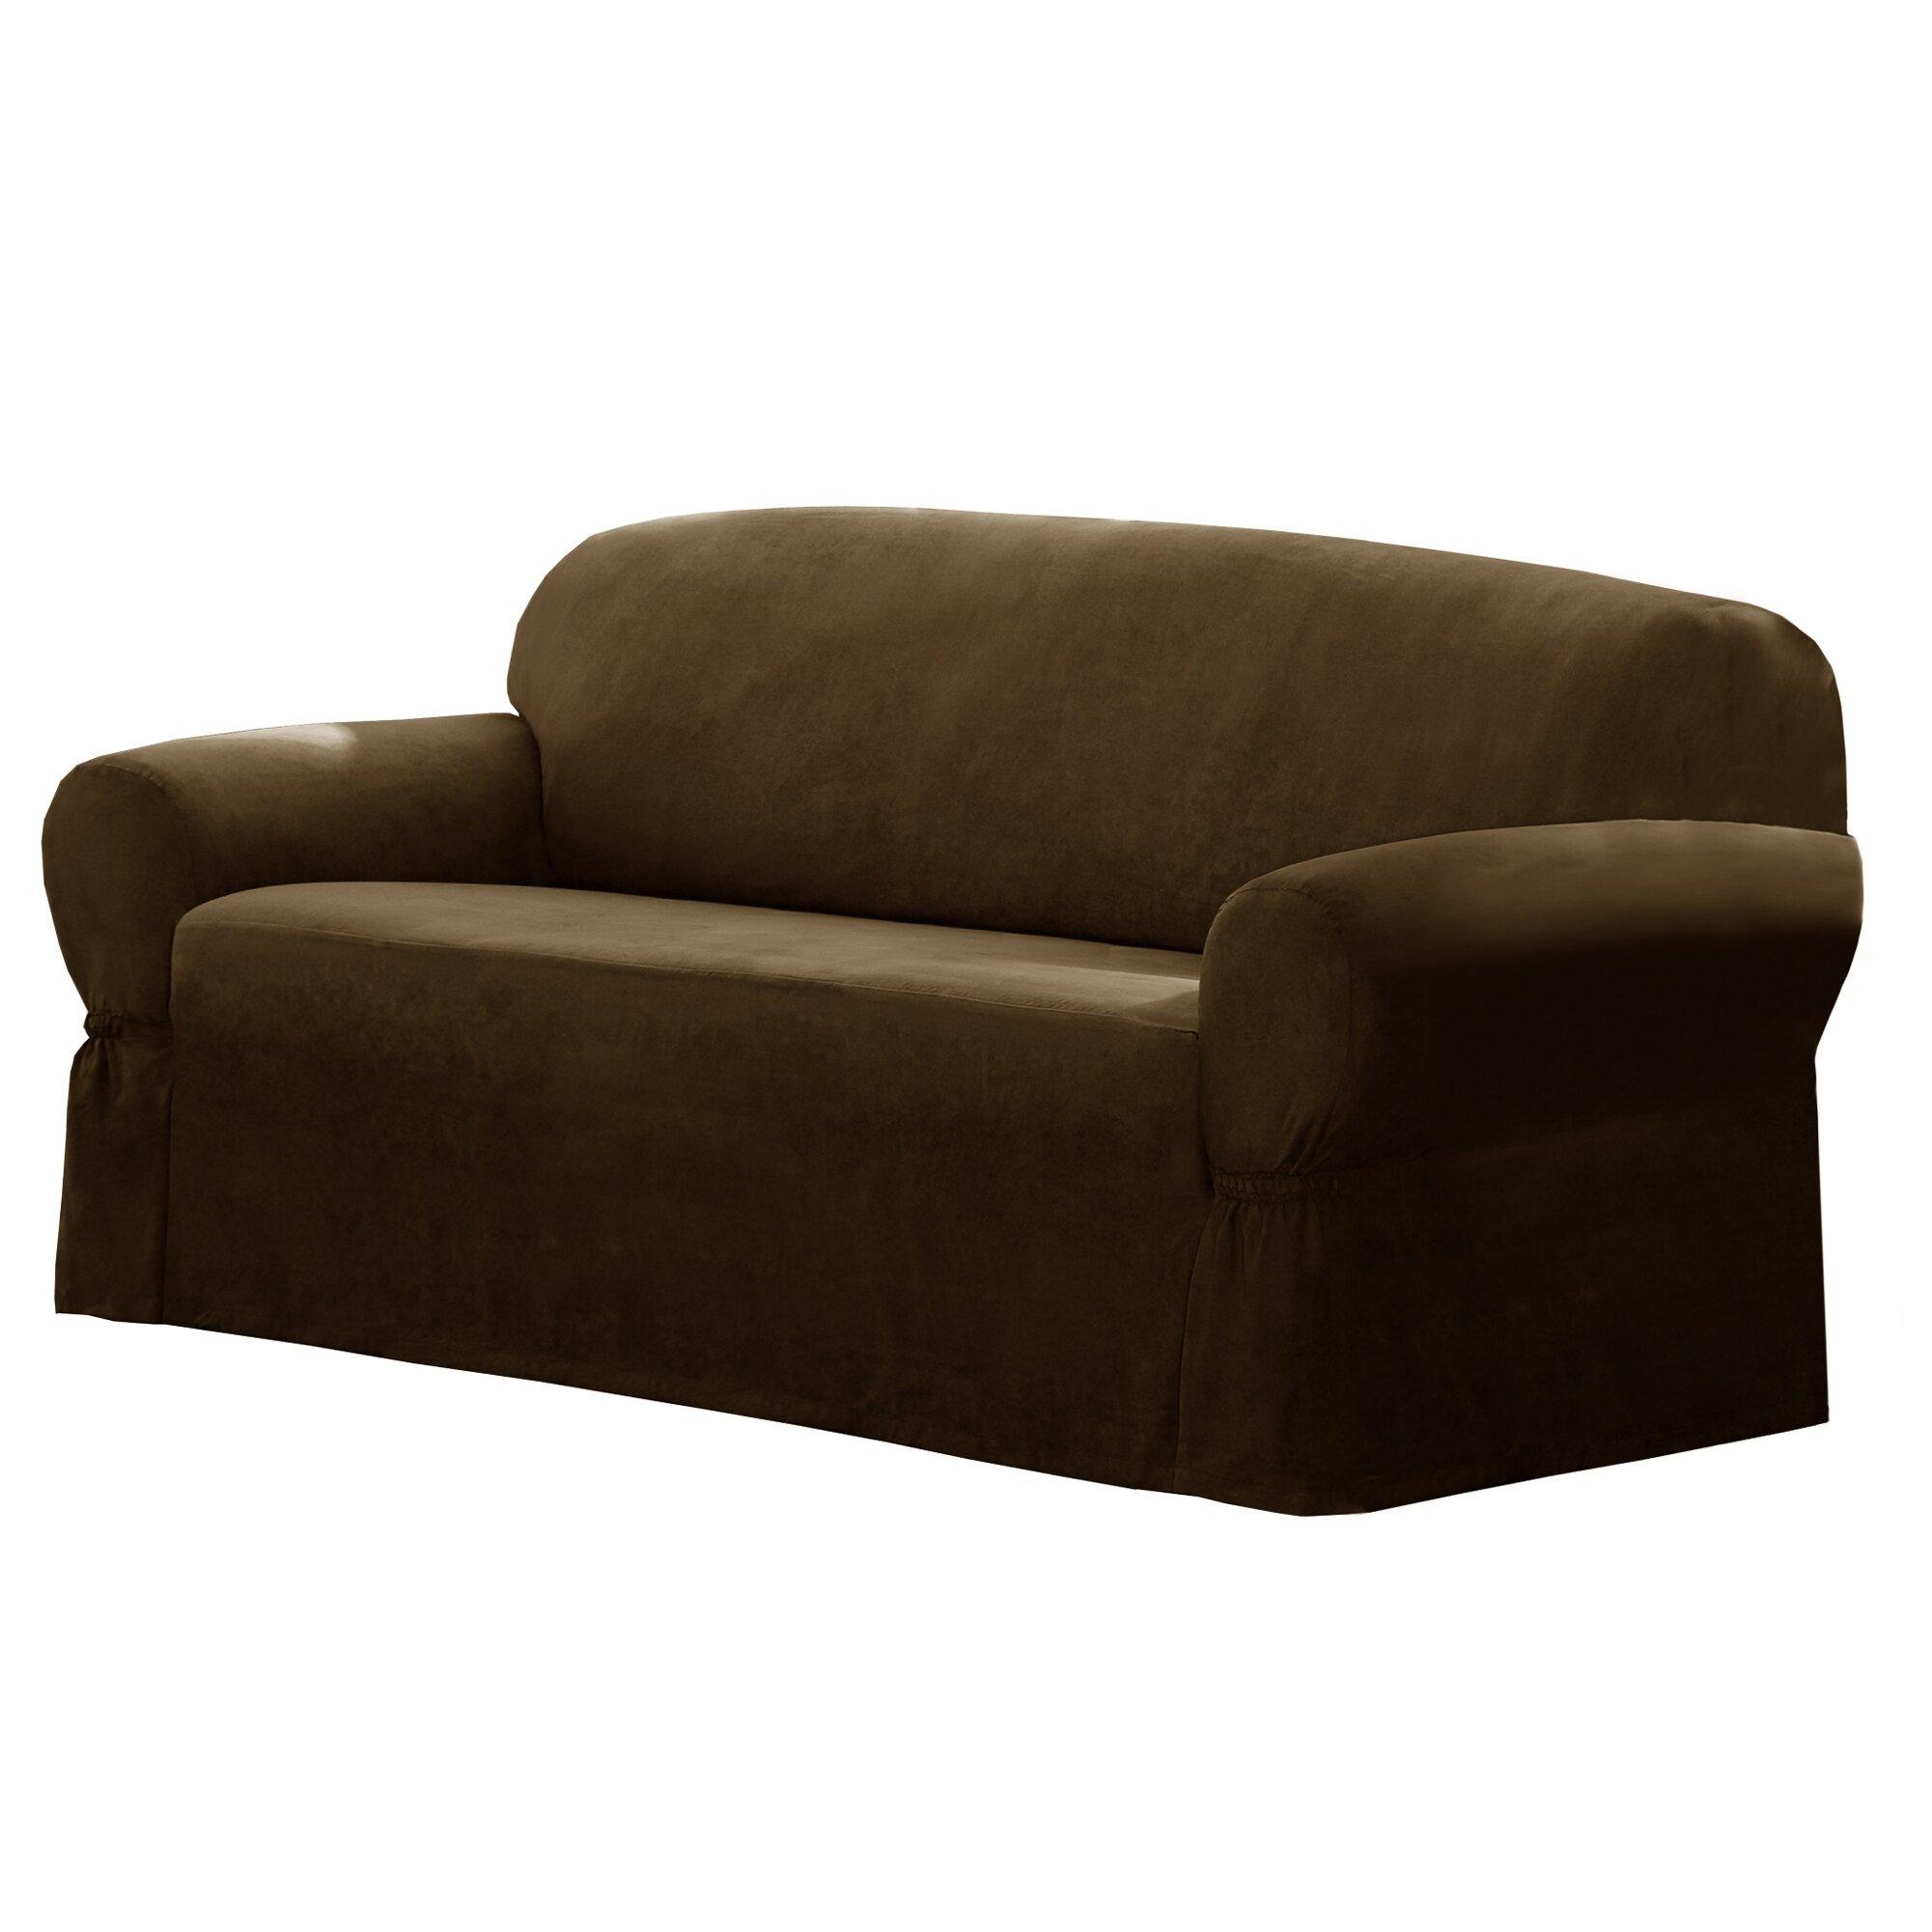 maytex t cushion loveseat sofa slipcover reviews wayfair. Black Bedroom Furniture Sets. Home Design Ideas